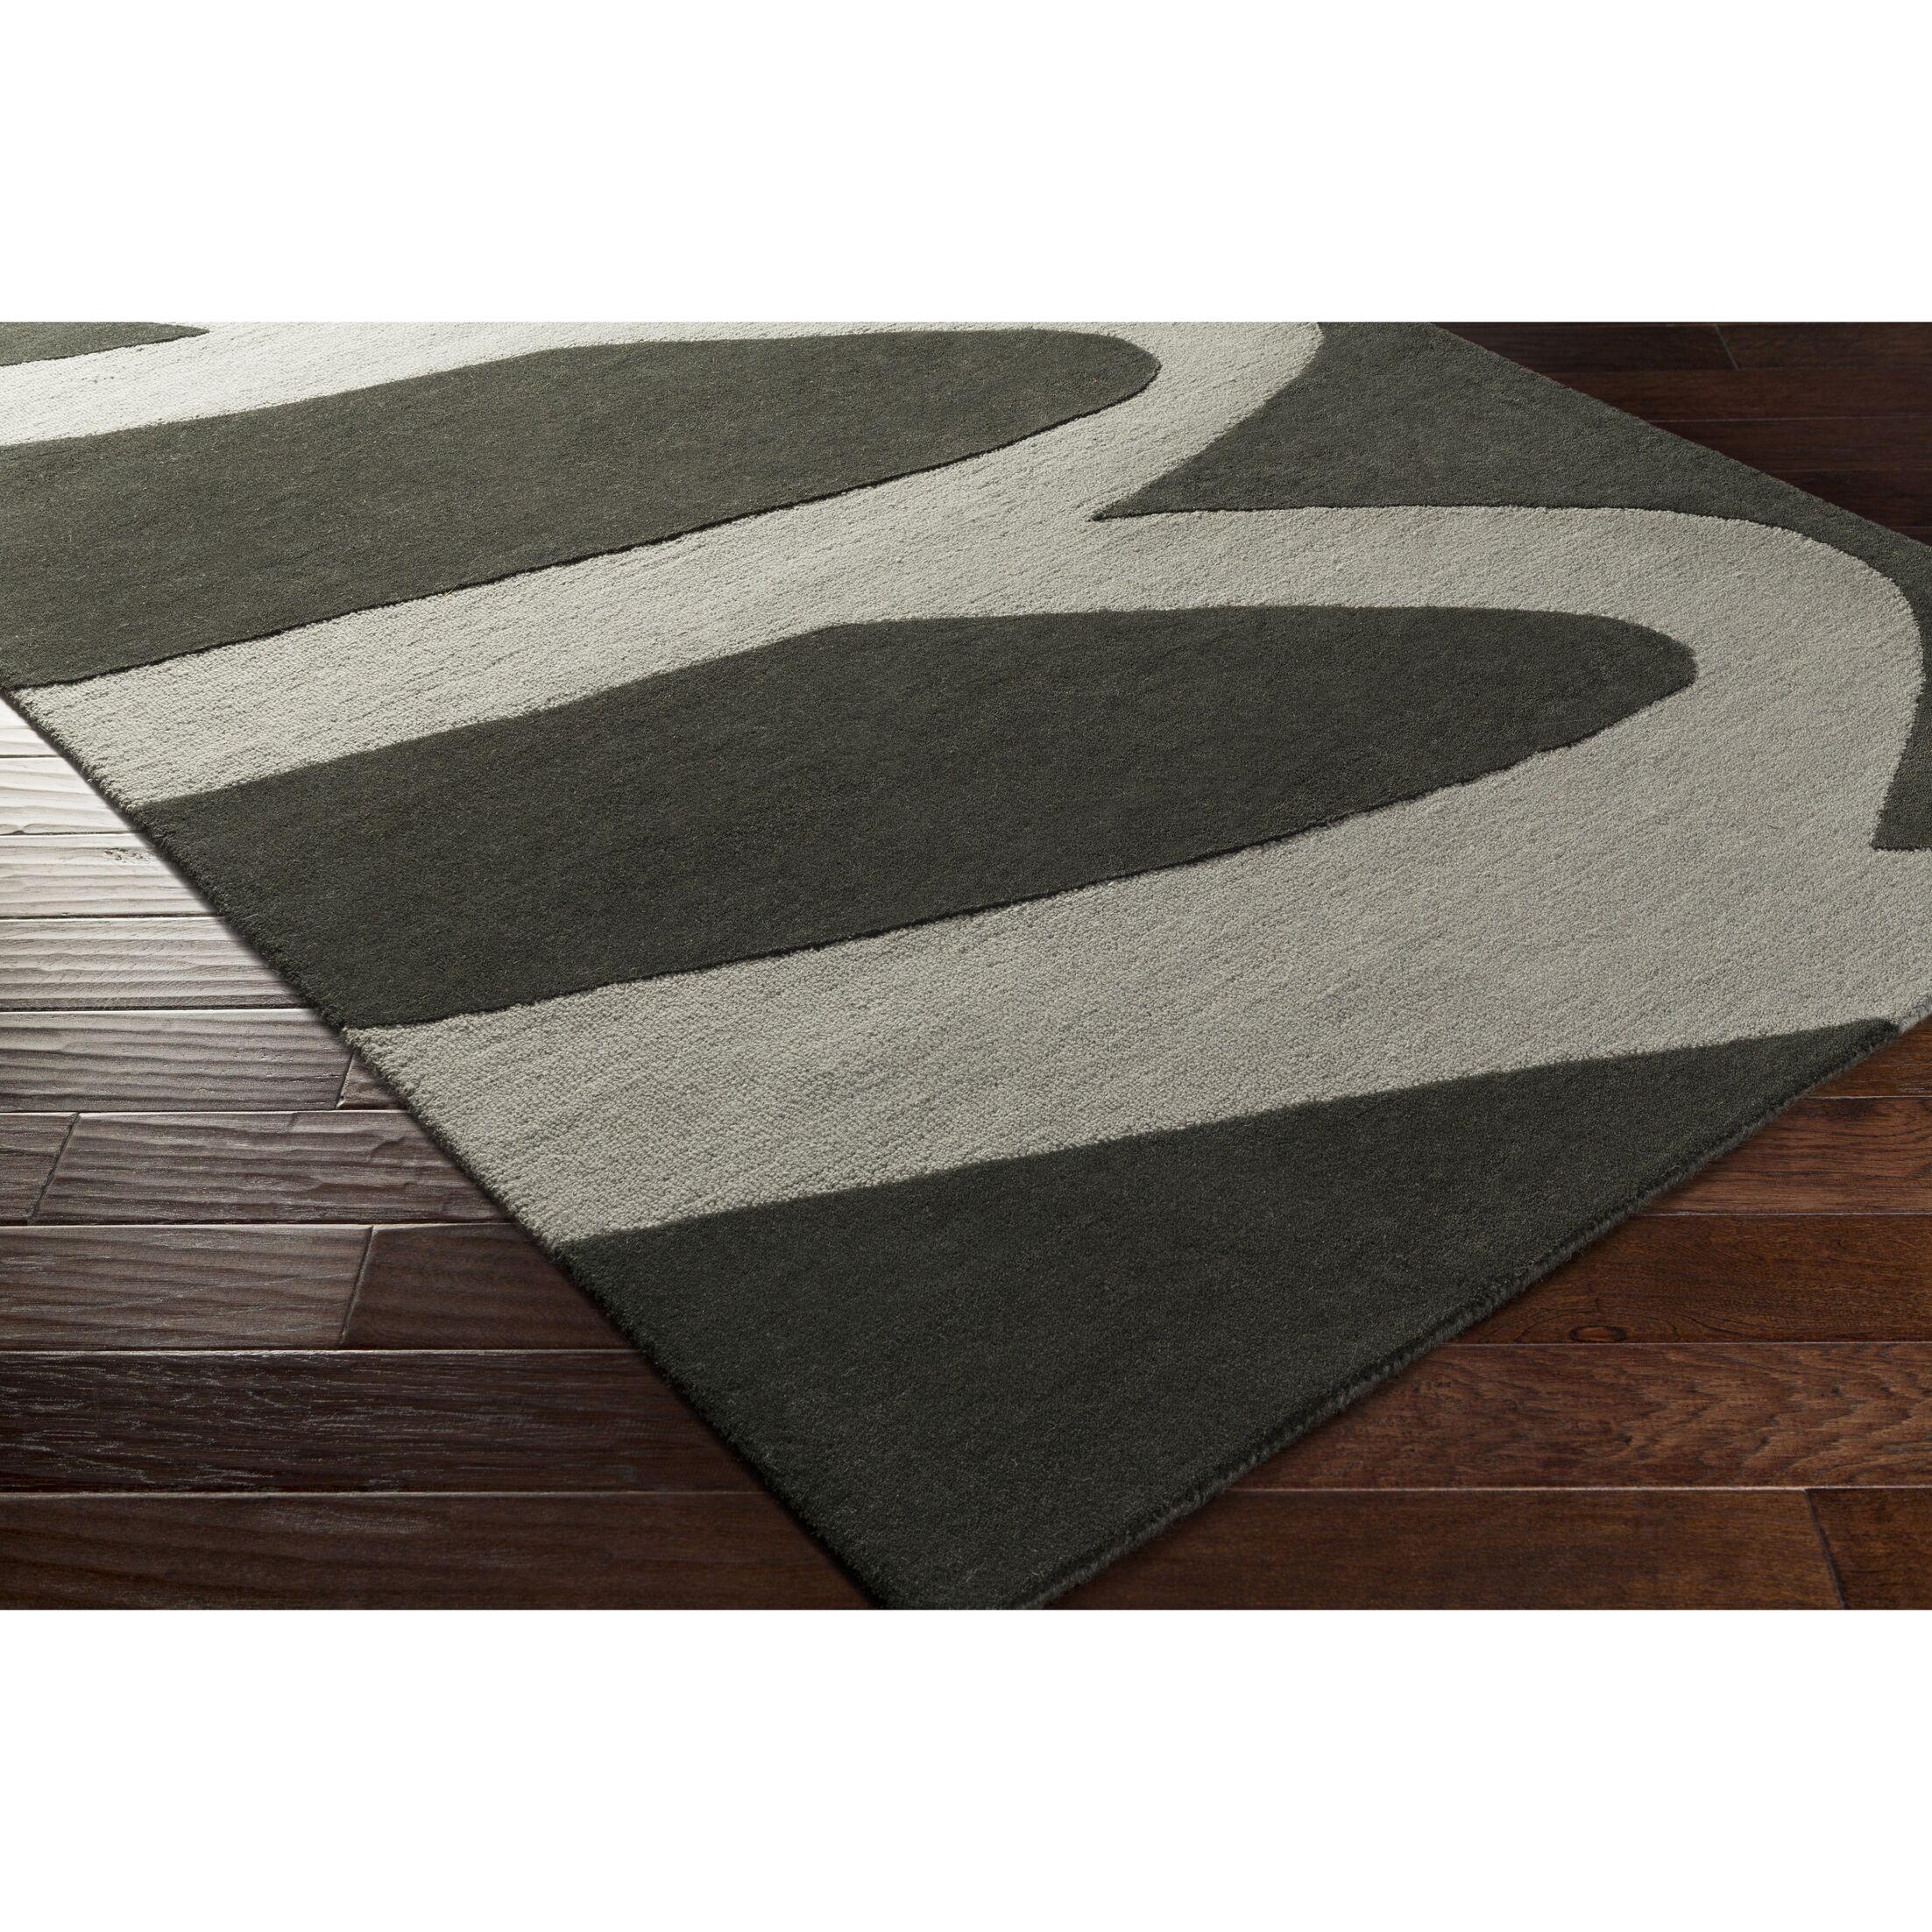 Nida Hand-Tufted Black/Gray Area Rug Rug Size: Rectangle 8' x 10'